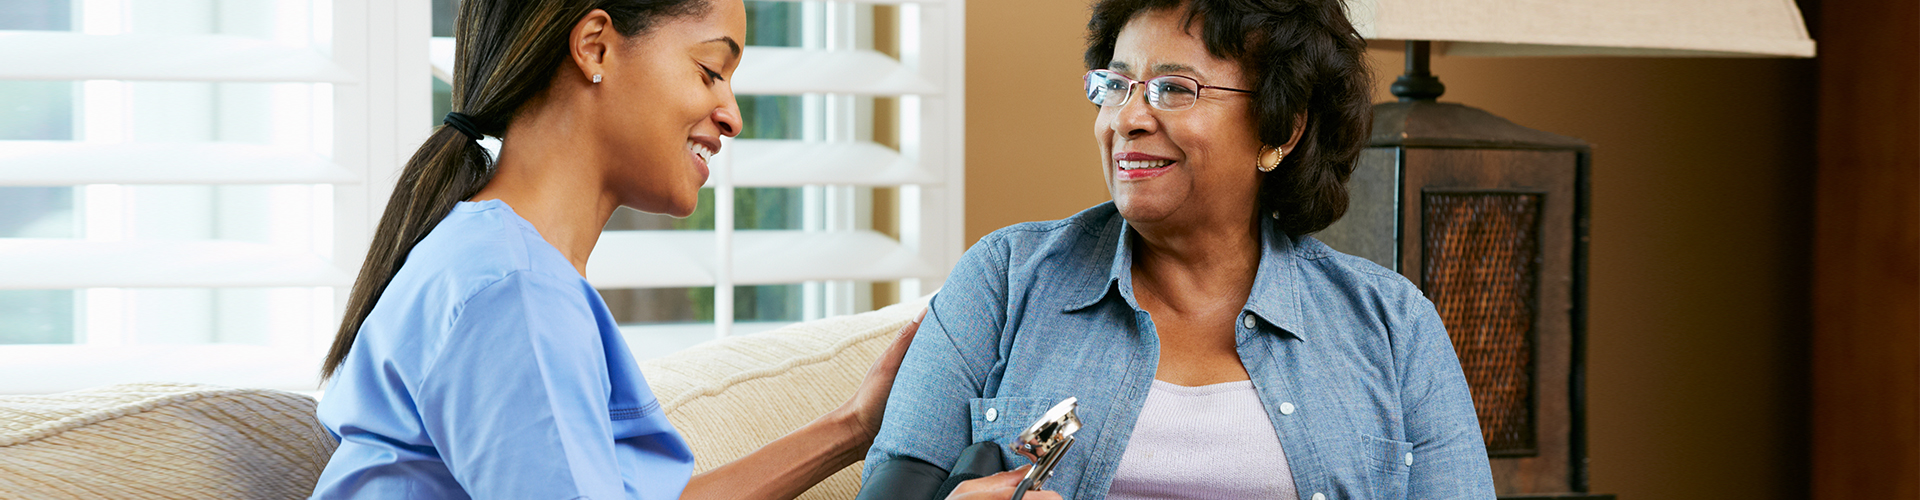 caretaker checks elder woman using stethoscope